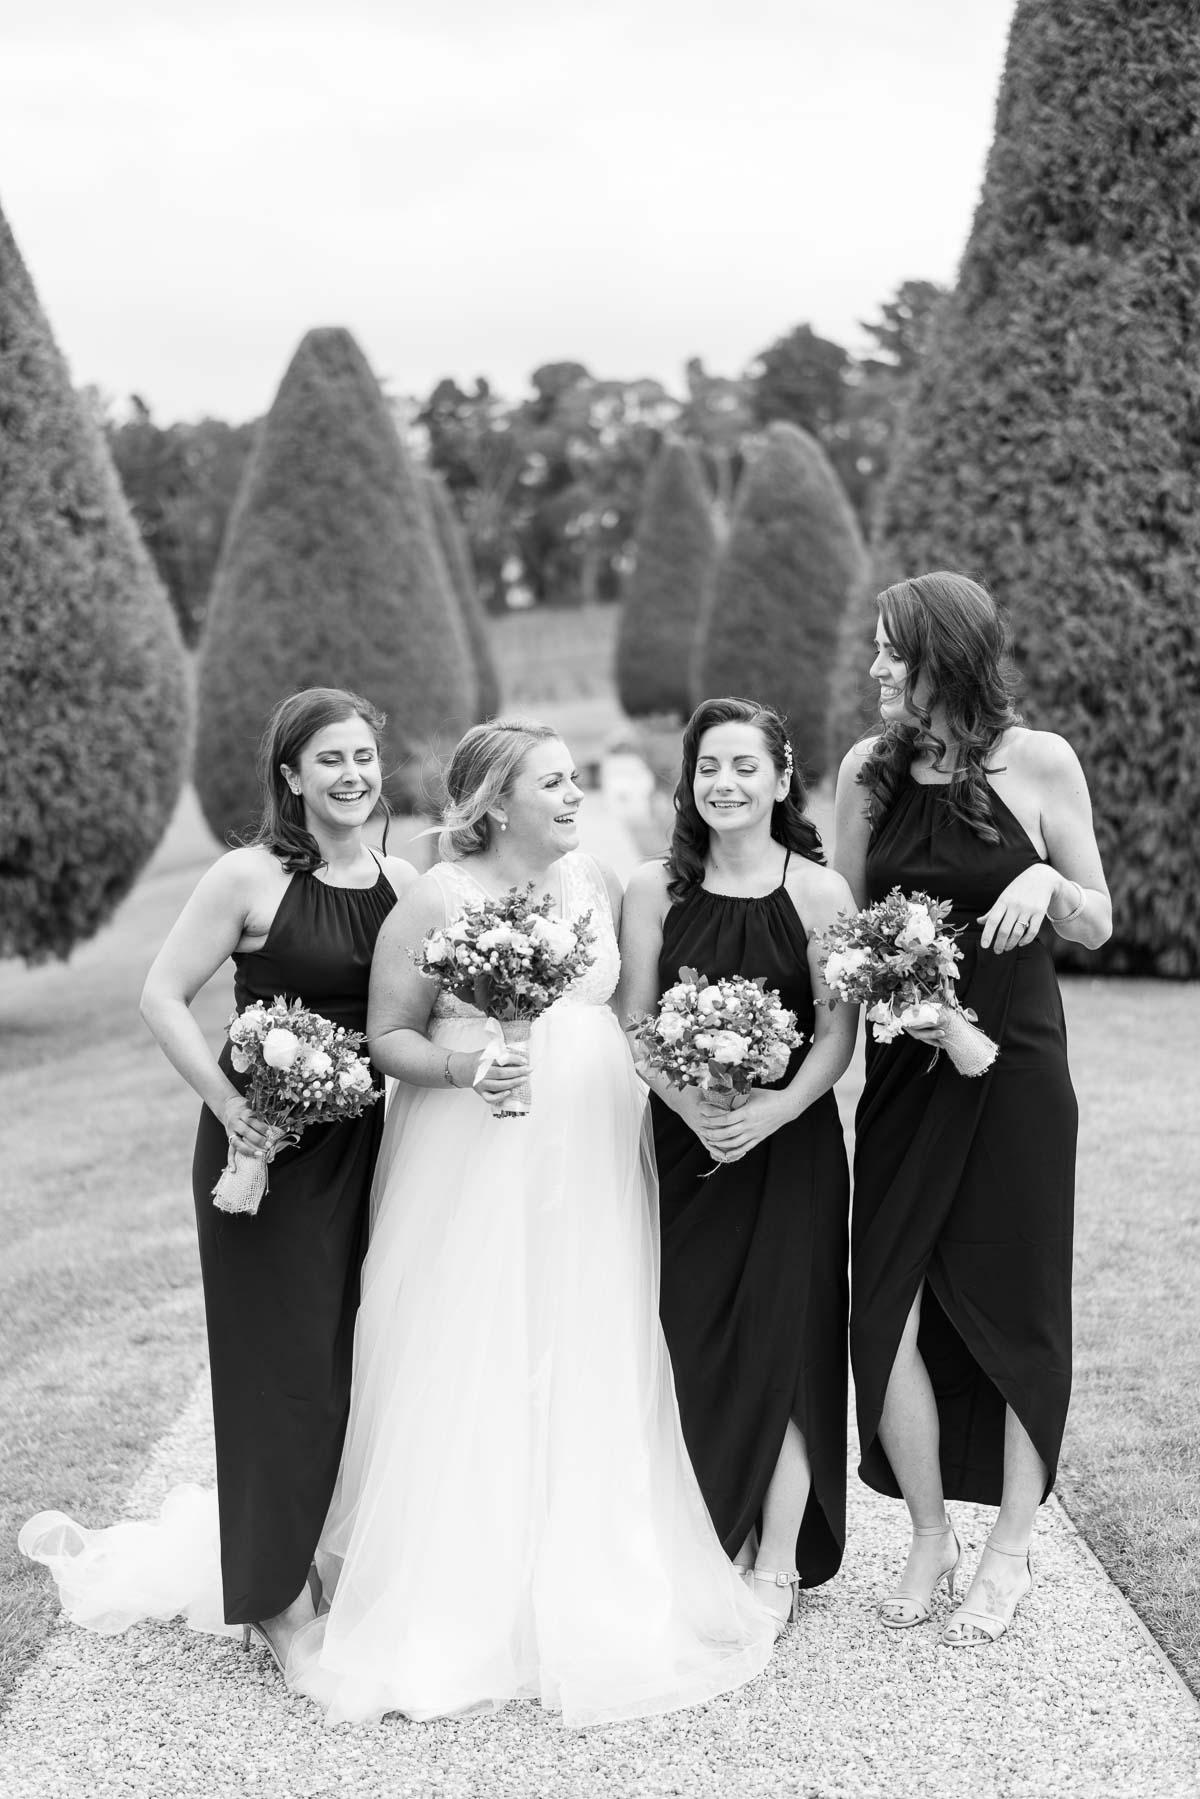 lindenderry-wedding-heart+soul-weddings-amy-alain-03600.jpg